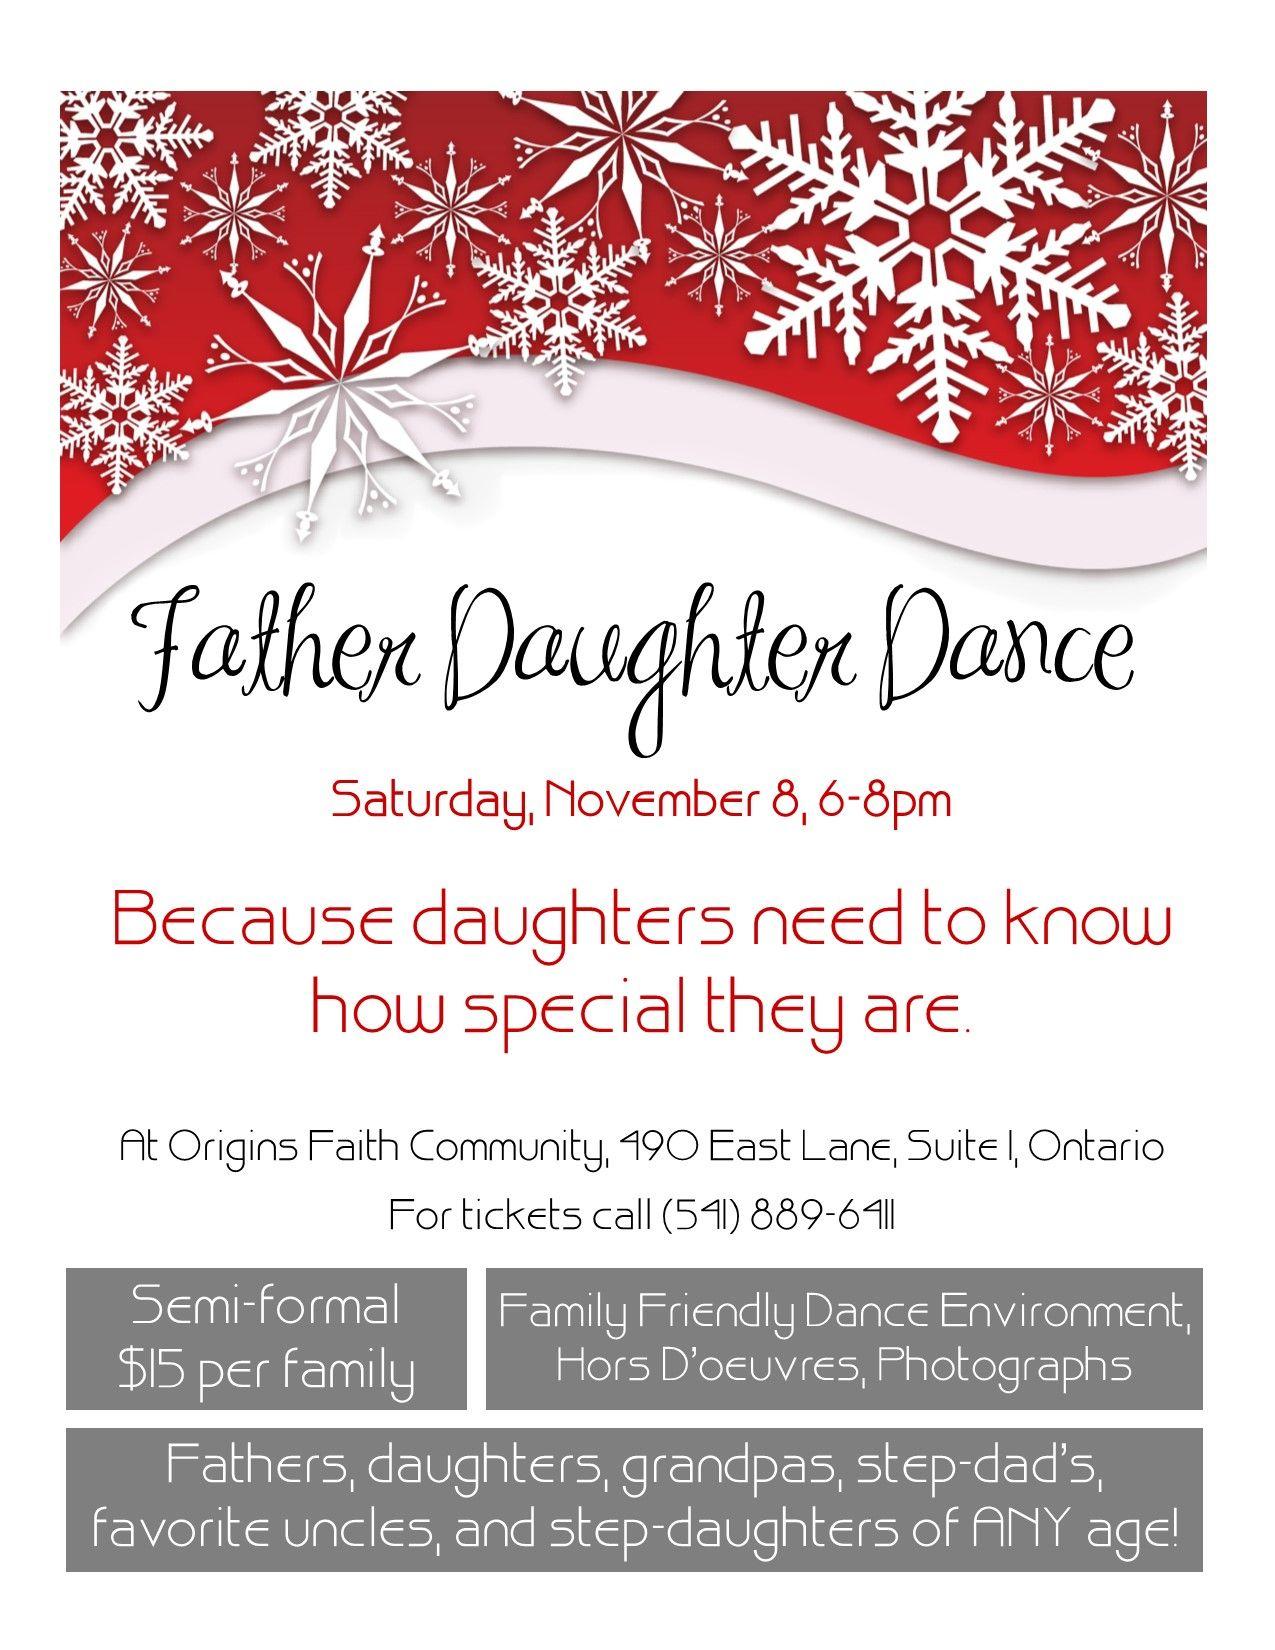 Father Daughter Dance Flyer 1275x1650 Pixels